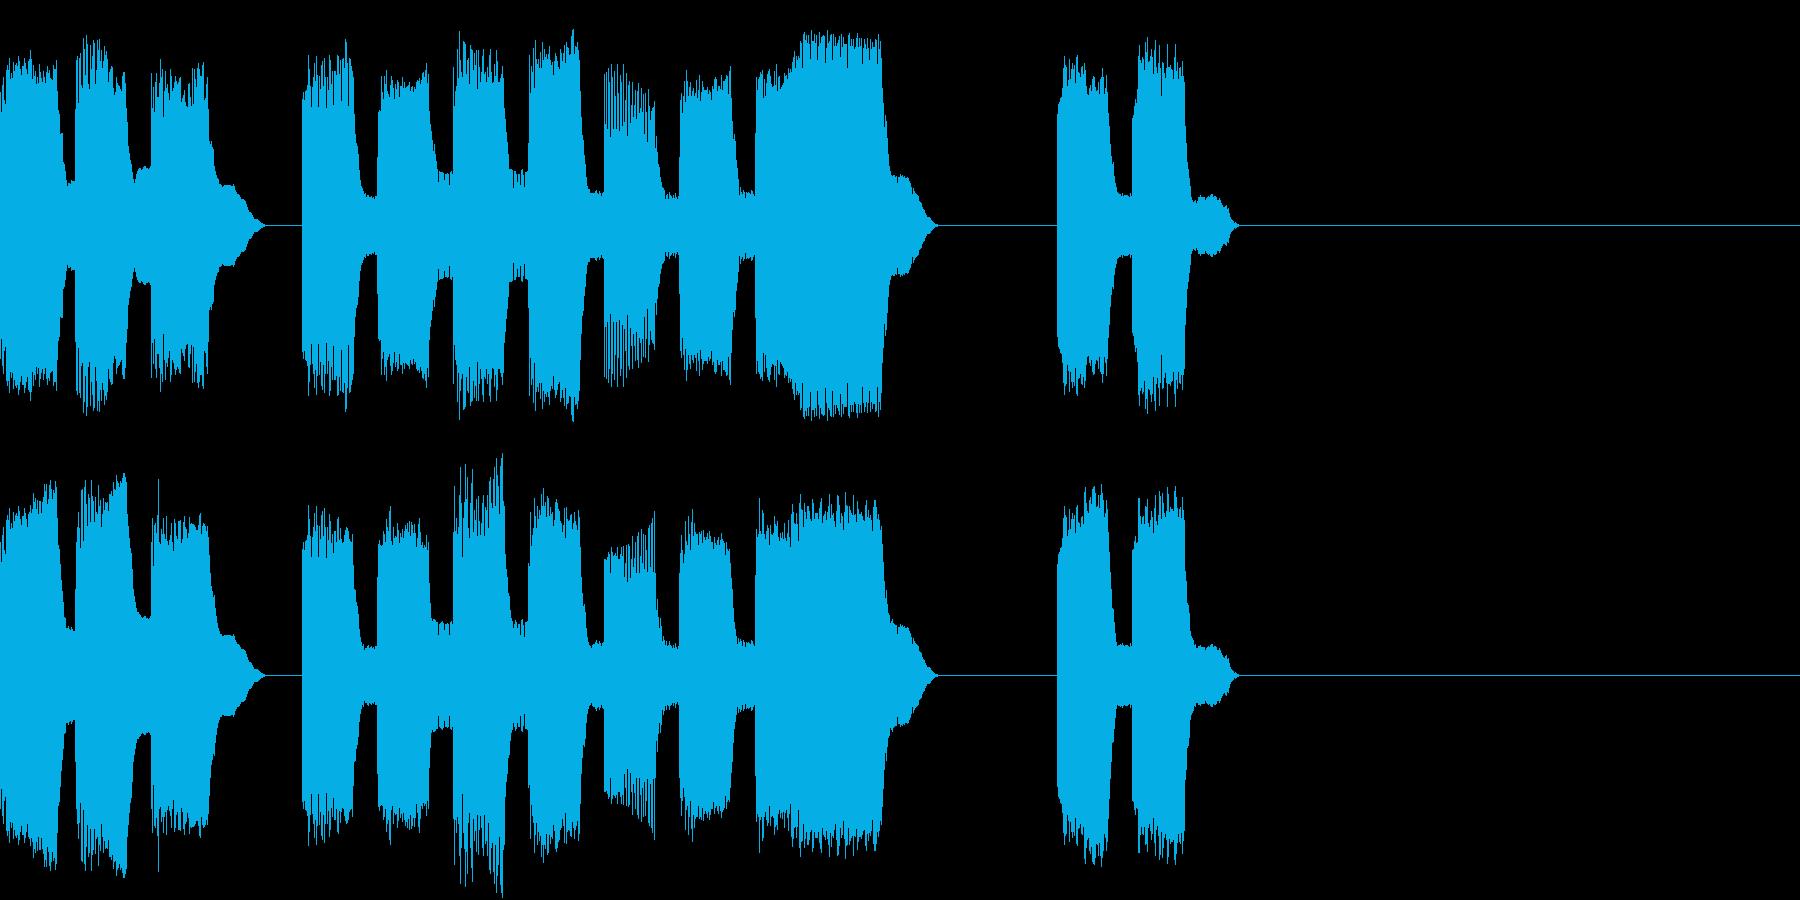 RetroGame 可愛いゲームオーバーの再生済みの波形